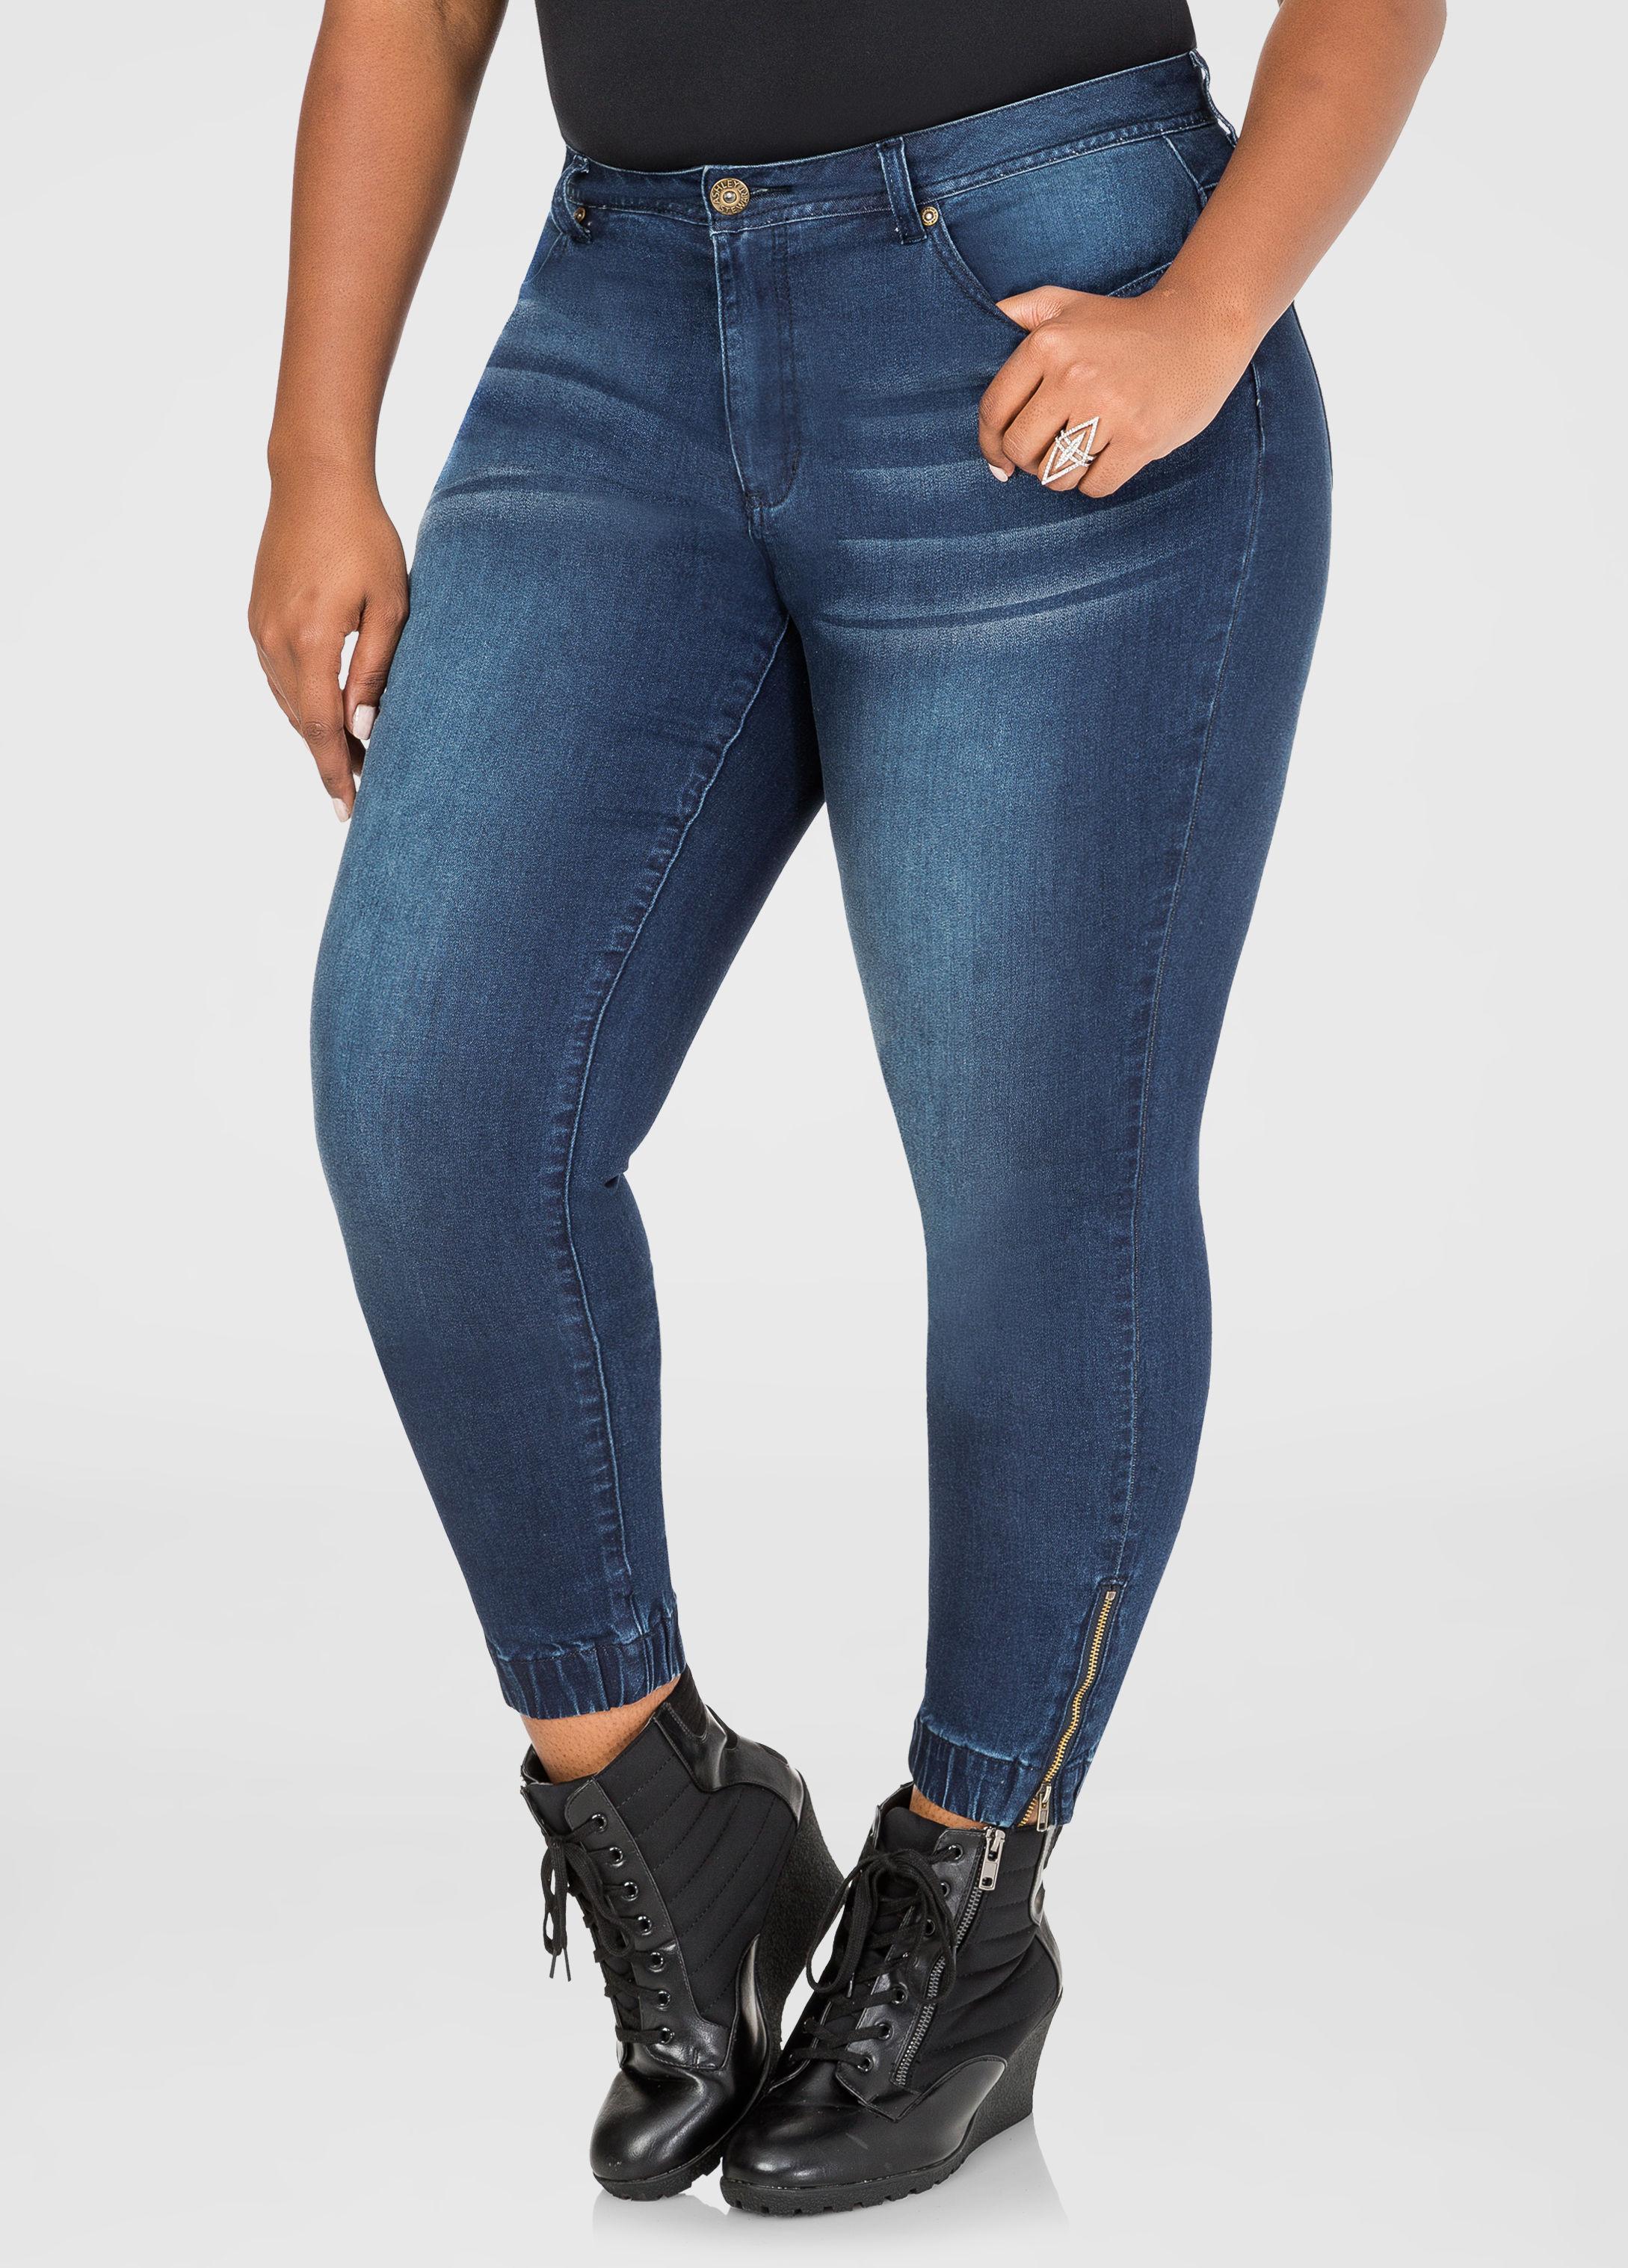 22880b3d7d5 Lyst - Ashley Stewart Jogger Leg Skinny Jean in Blue